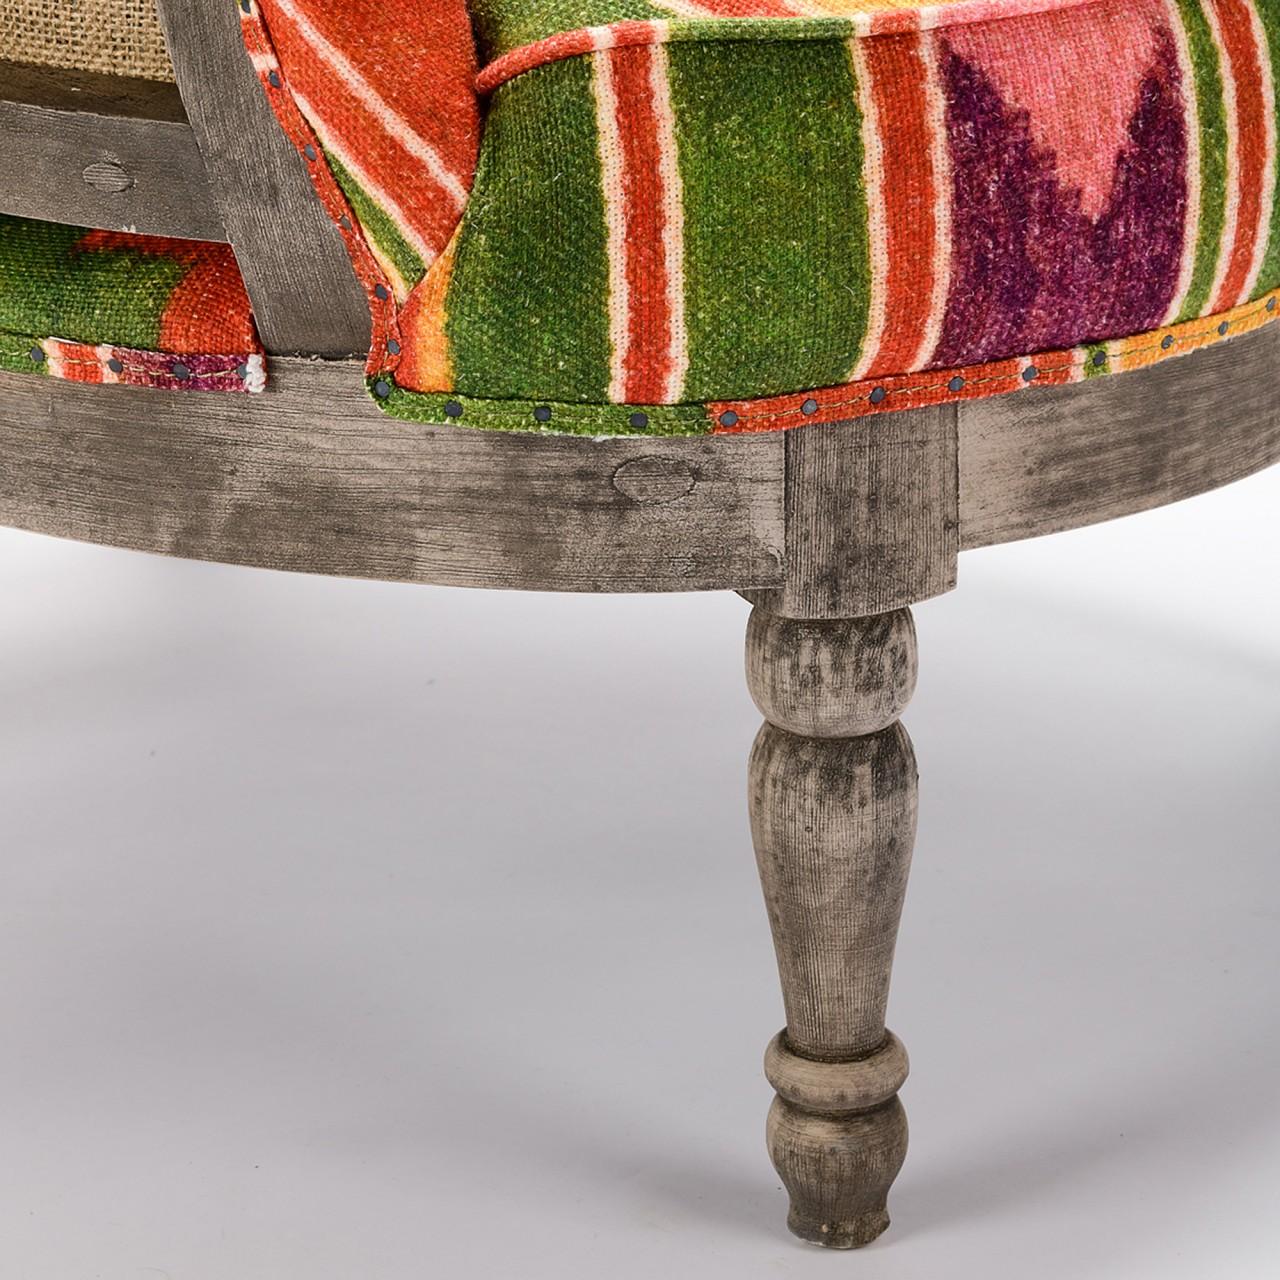 LOUIS DECONSTRUCTED CHAIR - ERDELY Linen